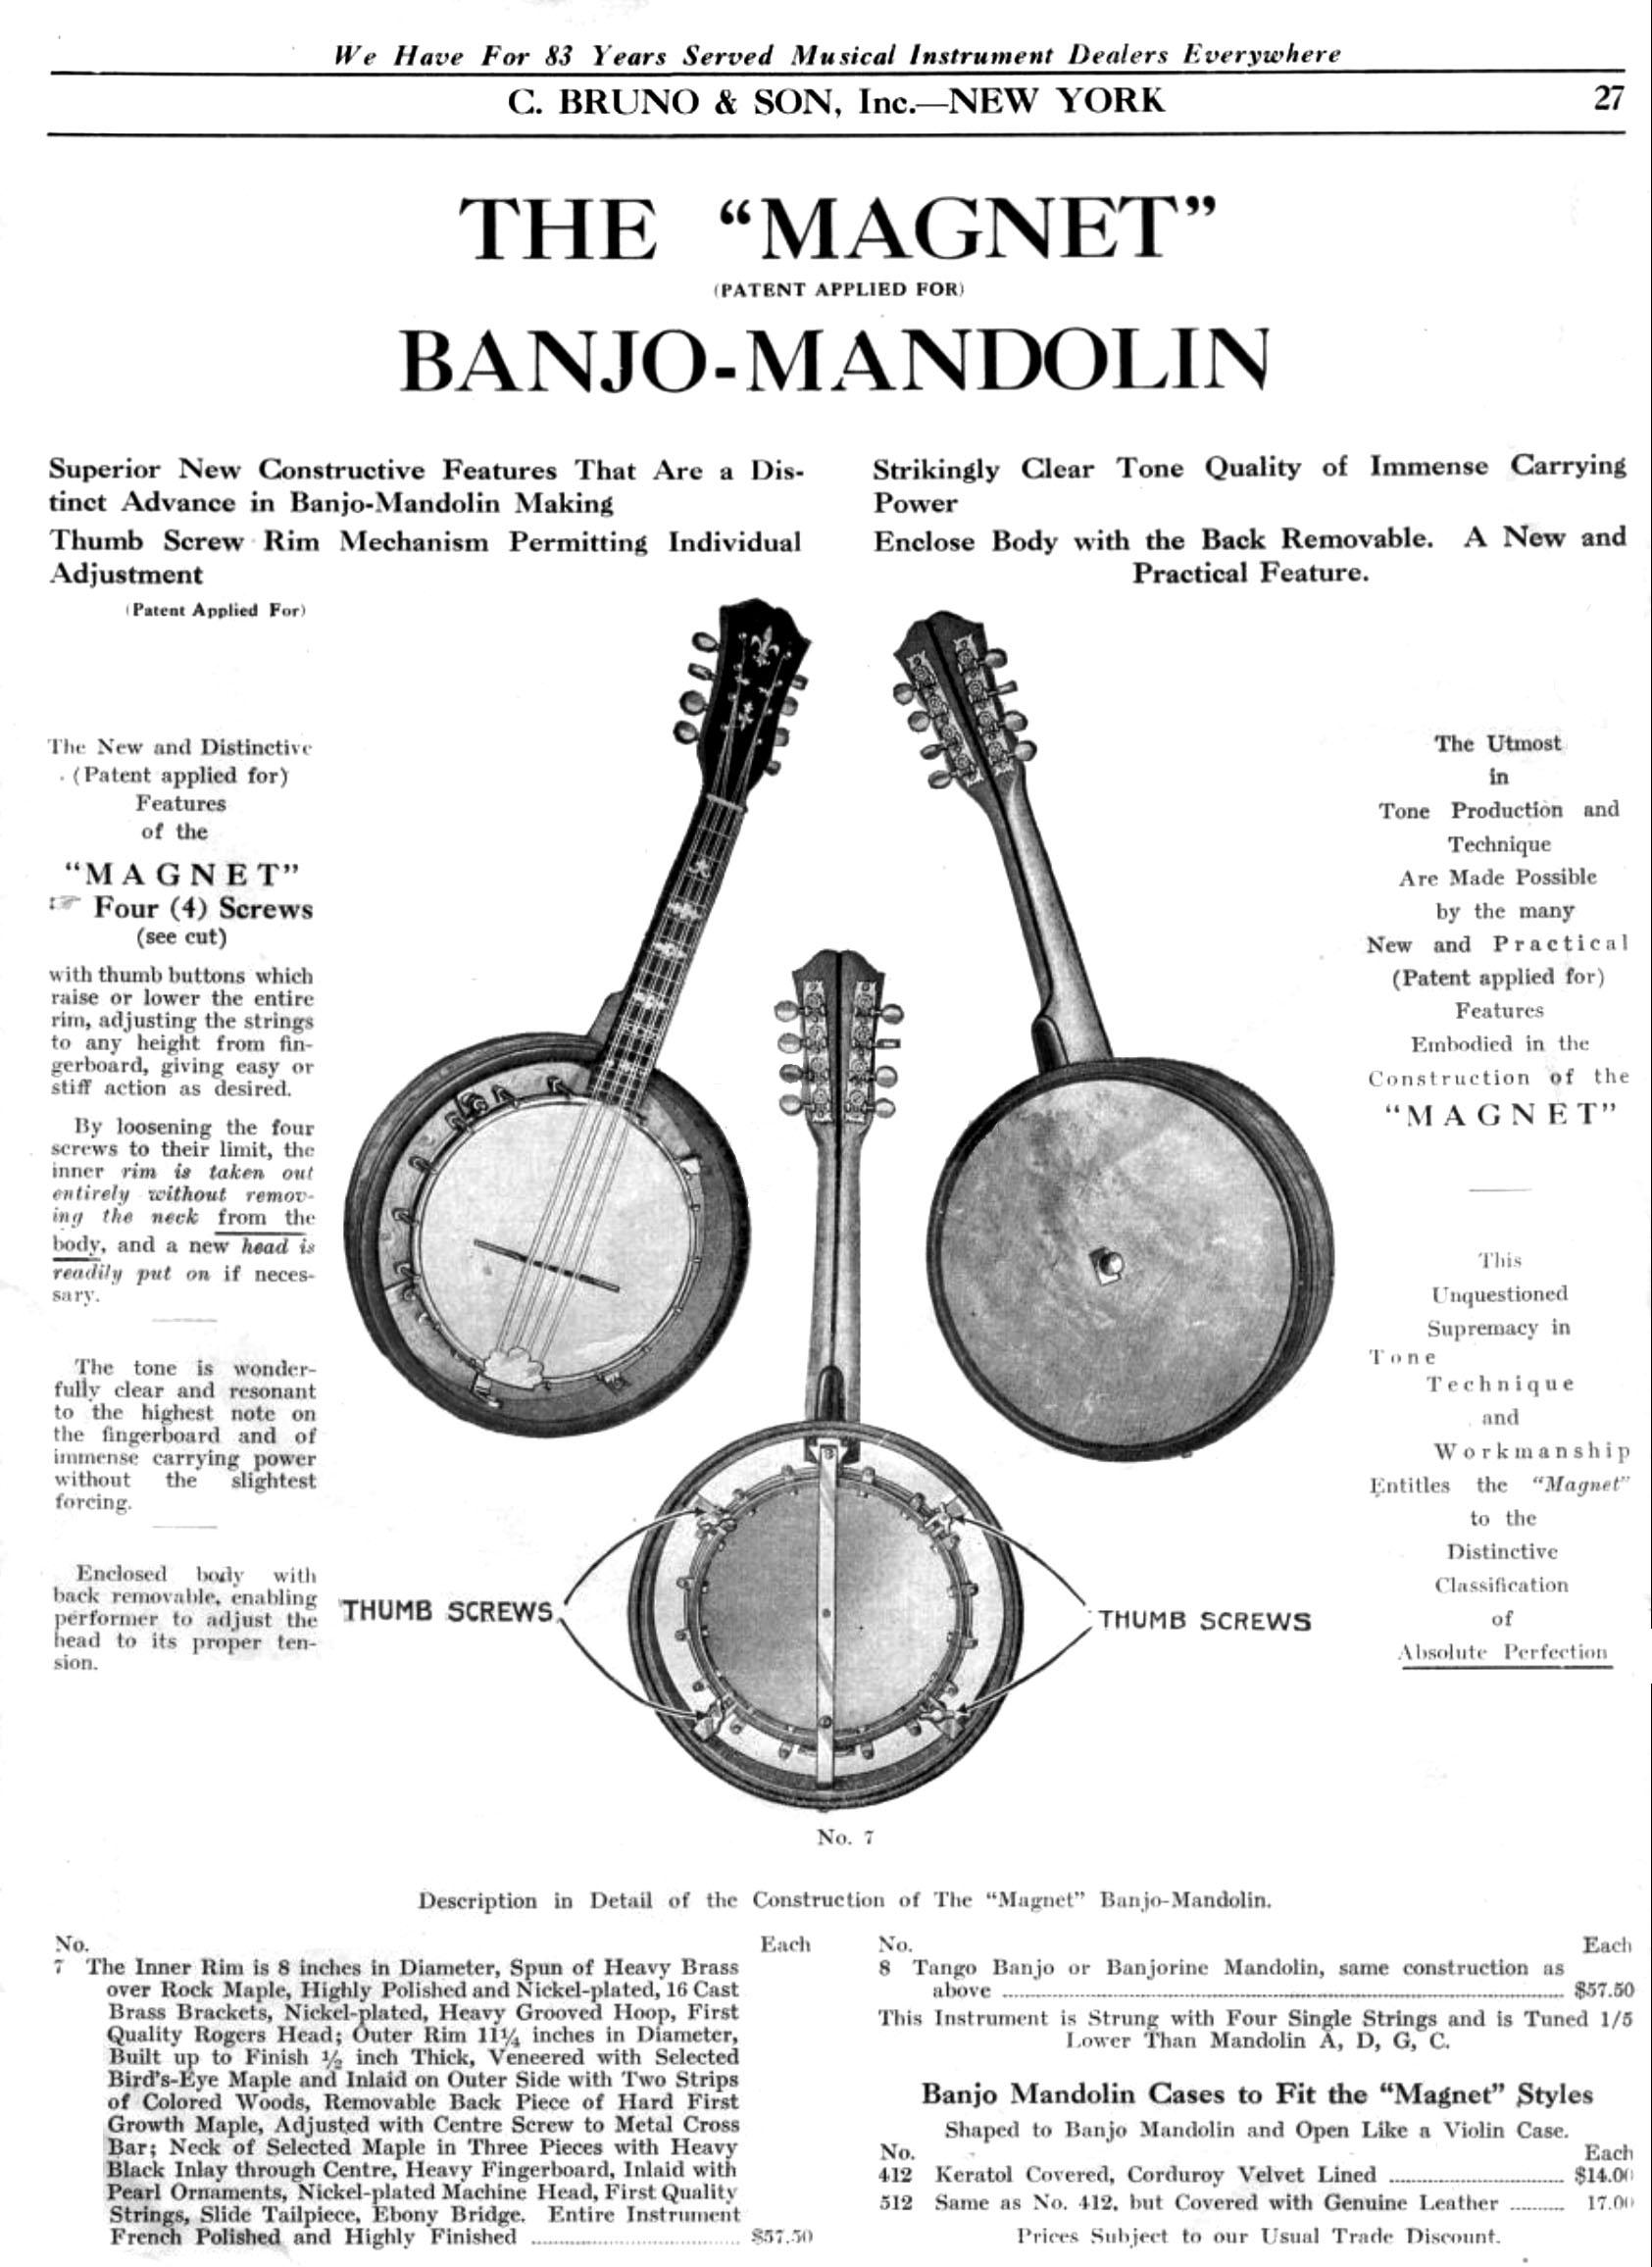 PICCOLO PLACE - Piccolo Banjos and Other Small Banjos